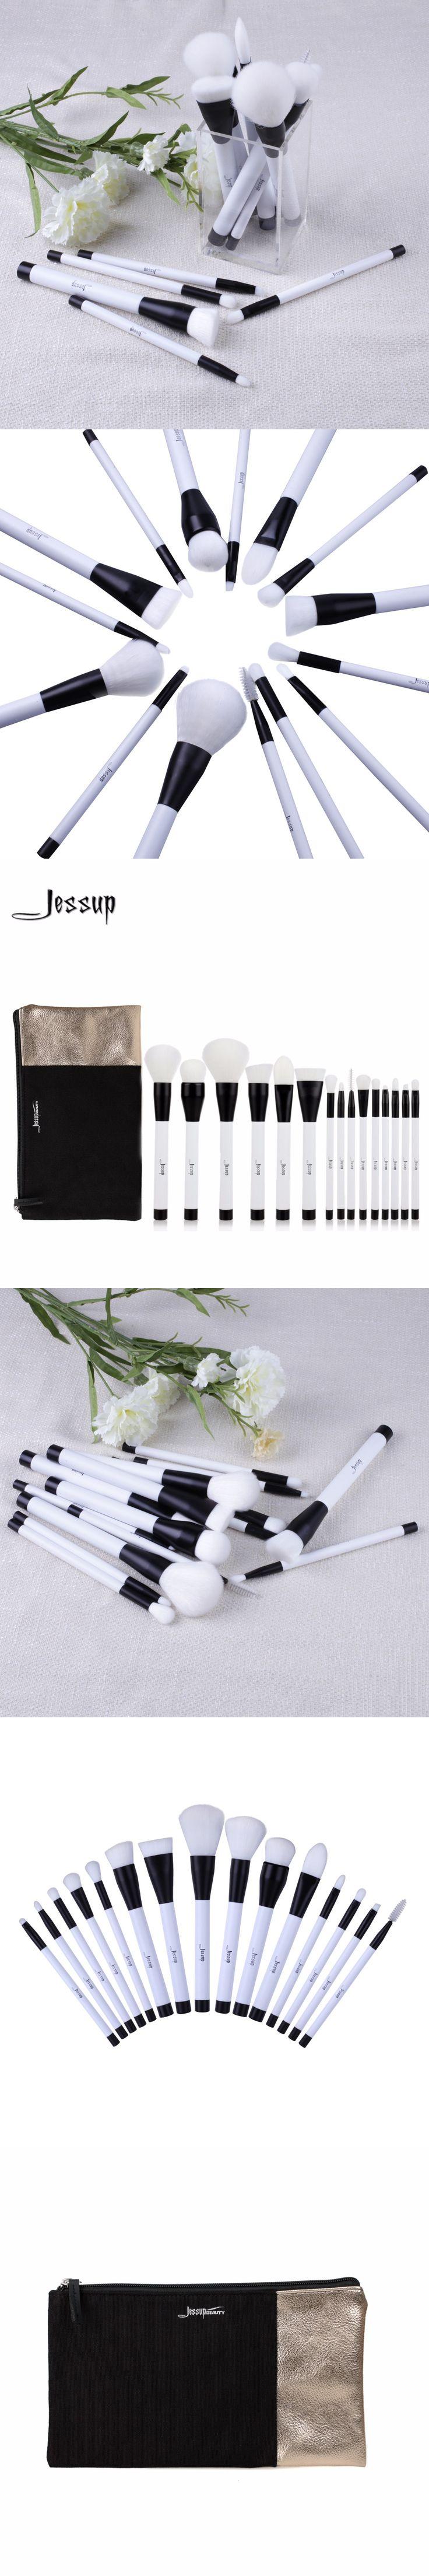 2017 Jessup Brushes 15pcs Beauty Makeup Brushes Set Brush Tool Black and White  Cosmetics Bags T115&CB002